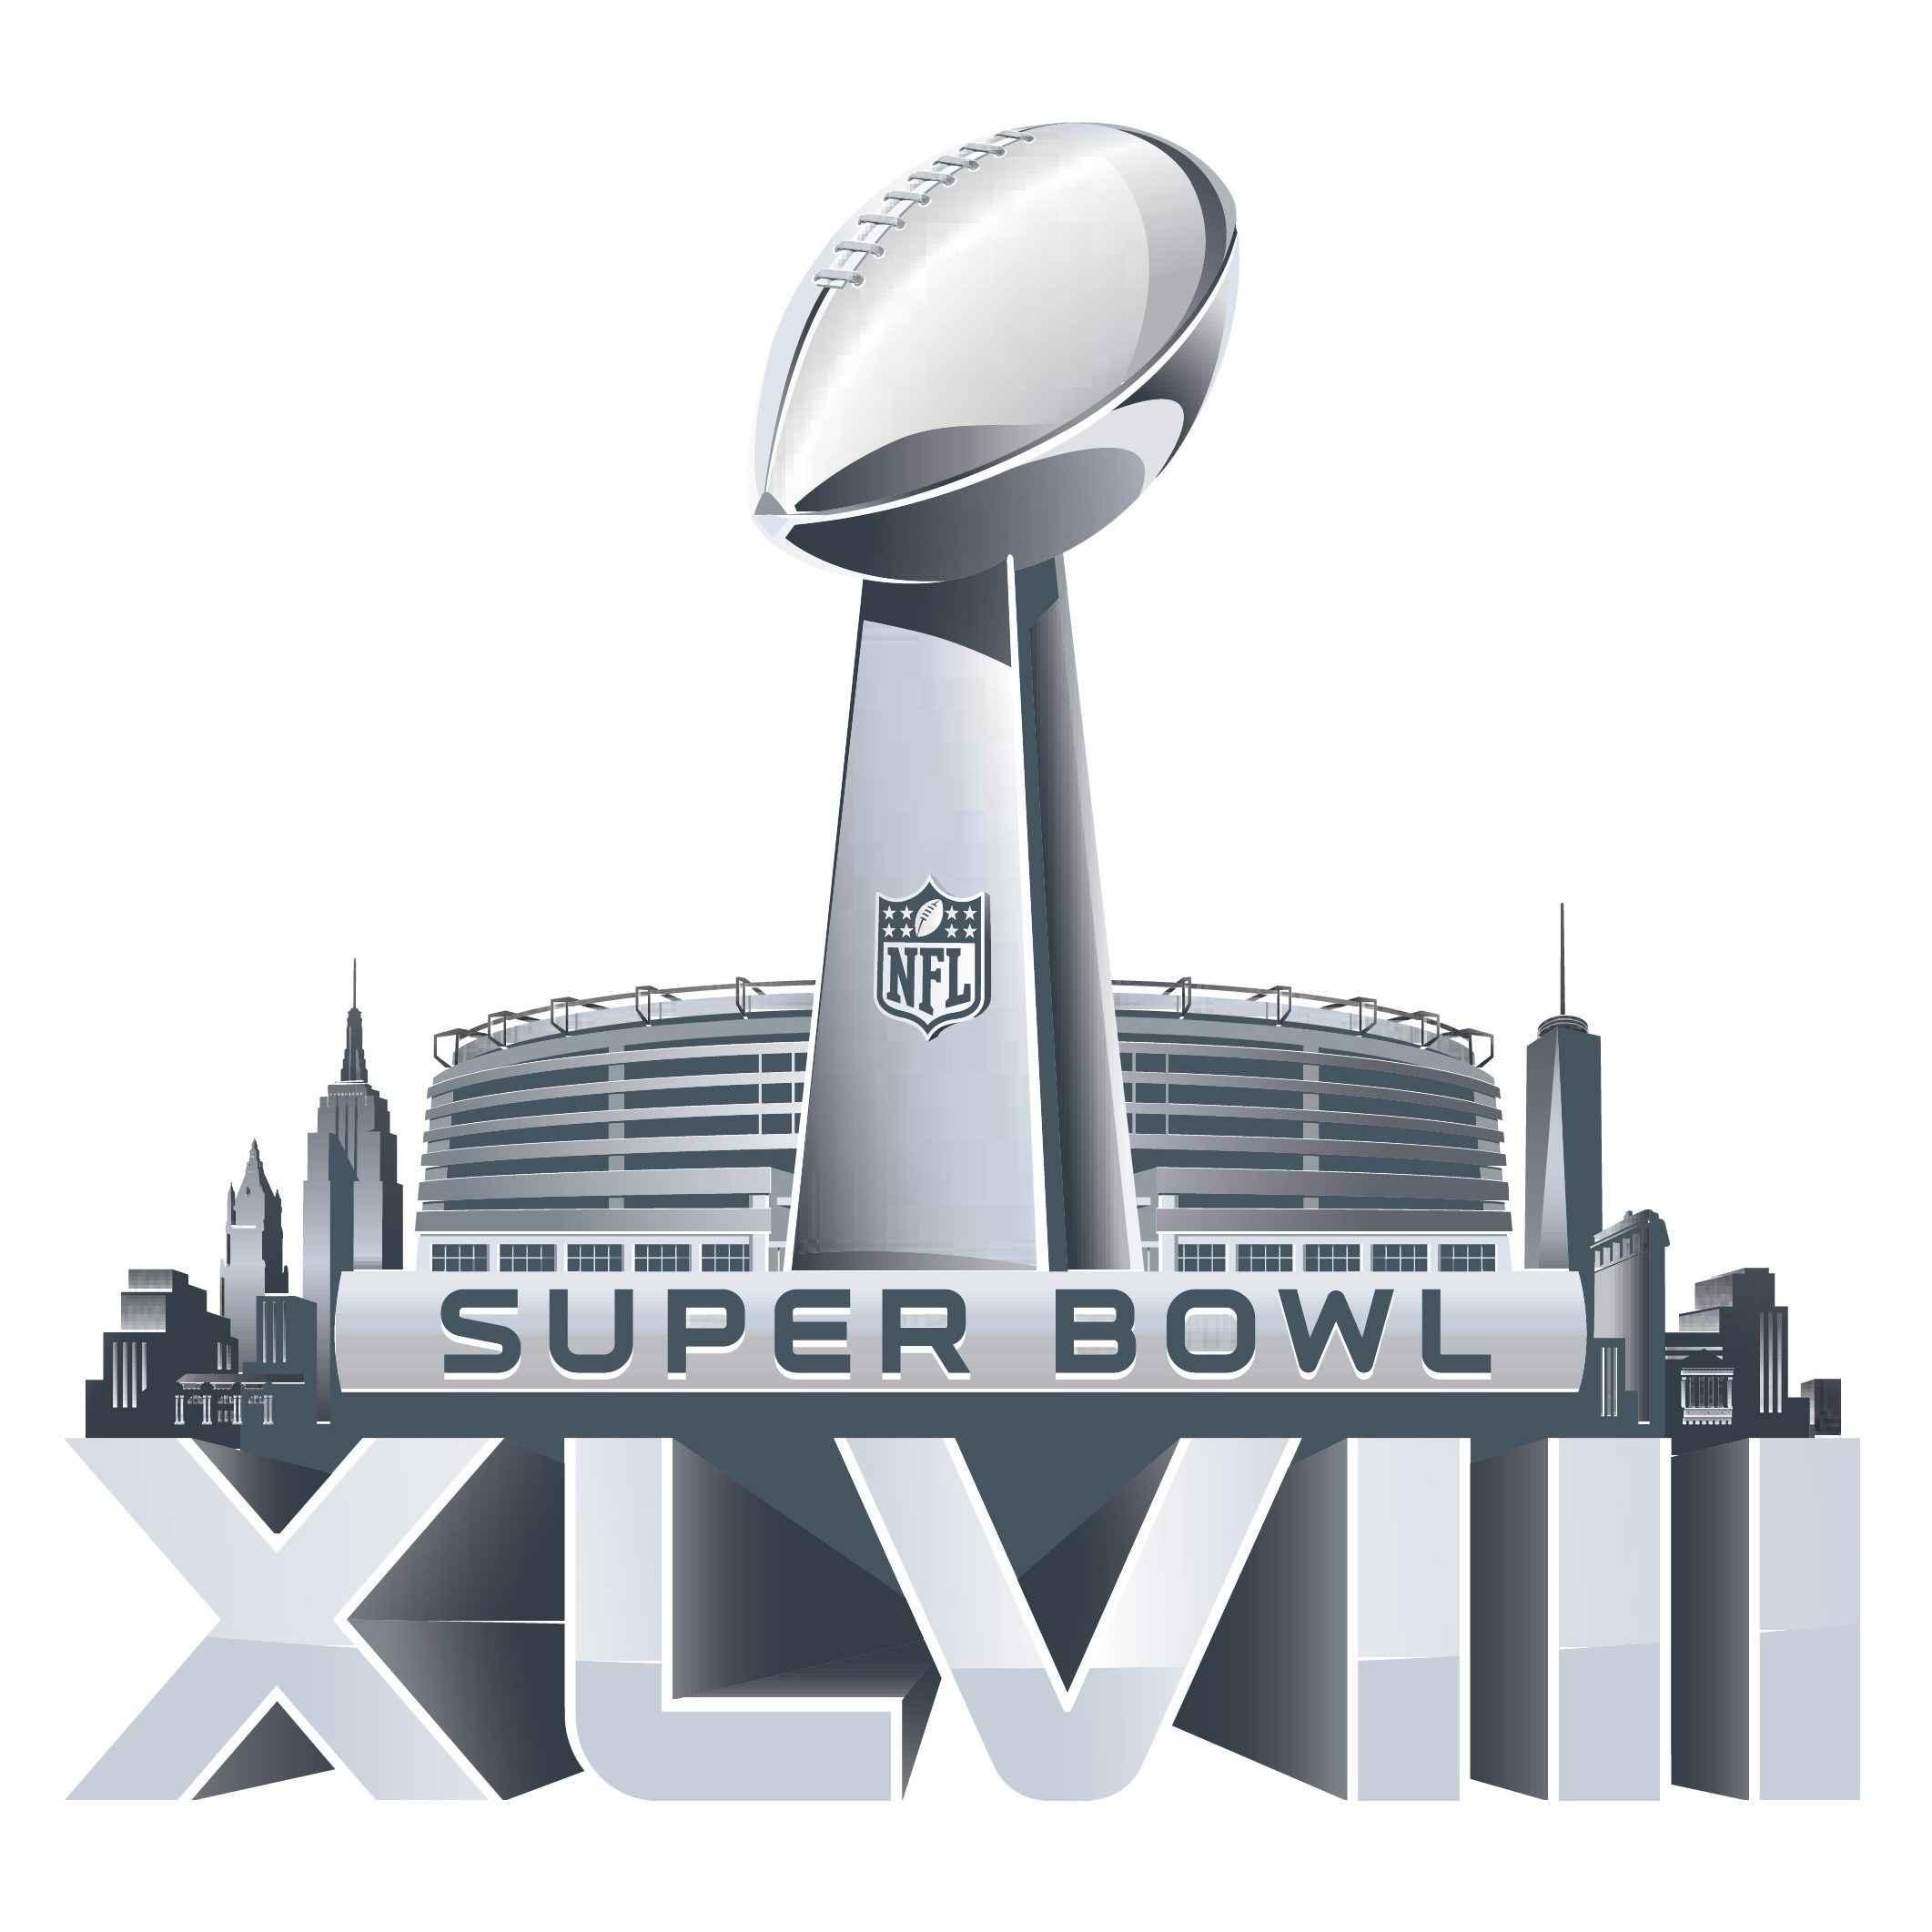 Super bowl xlviii logo nfl vector eps free download logo icons superbowlxlviiilogo biocorpaavc